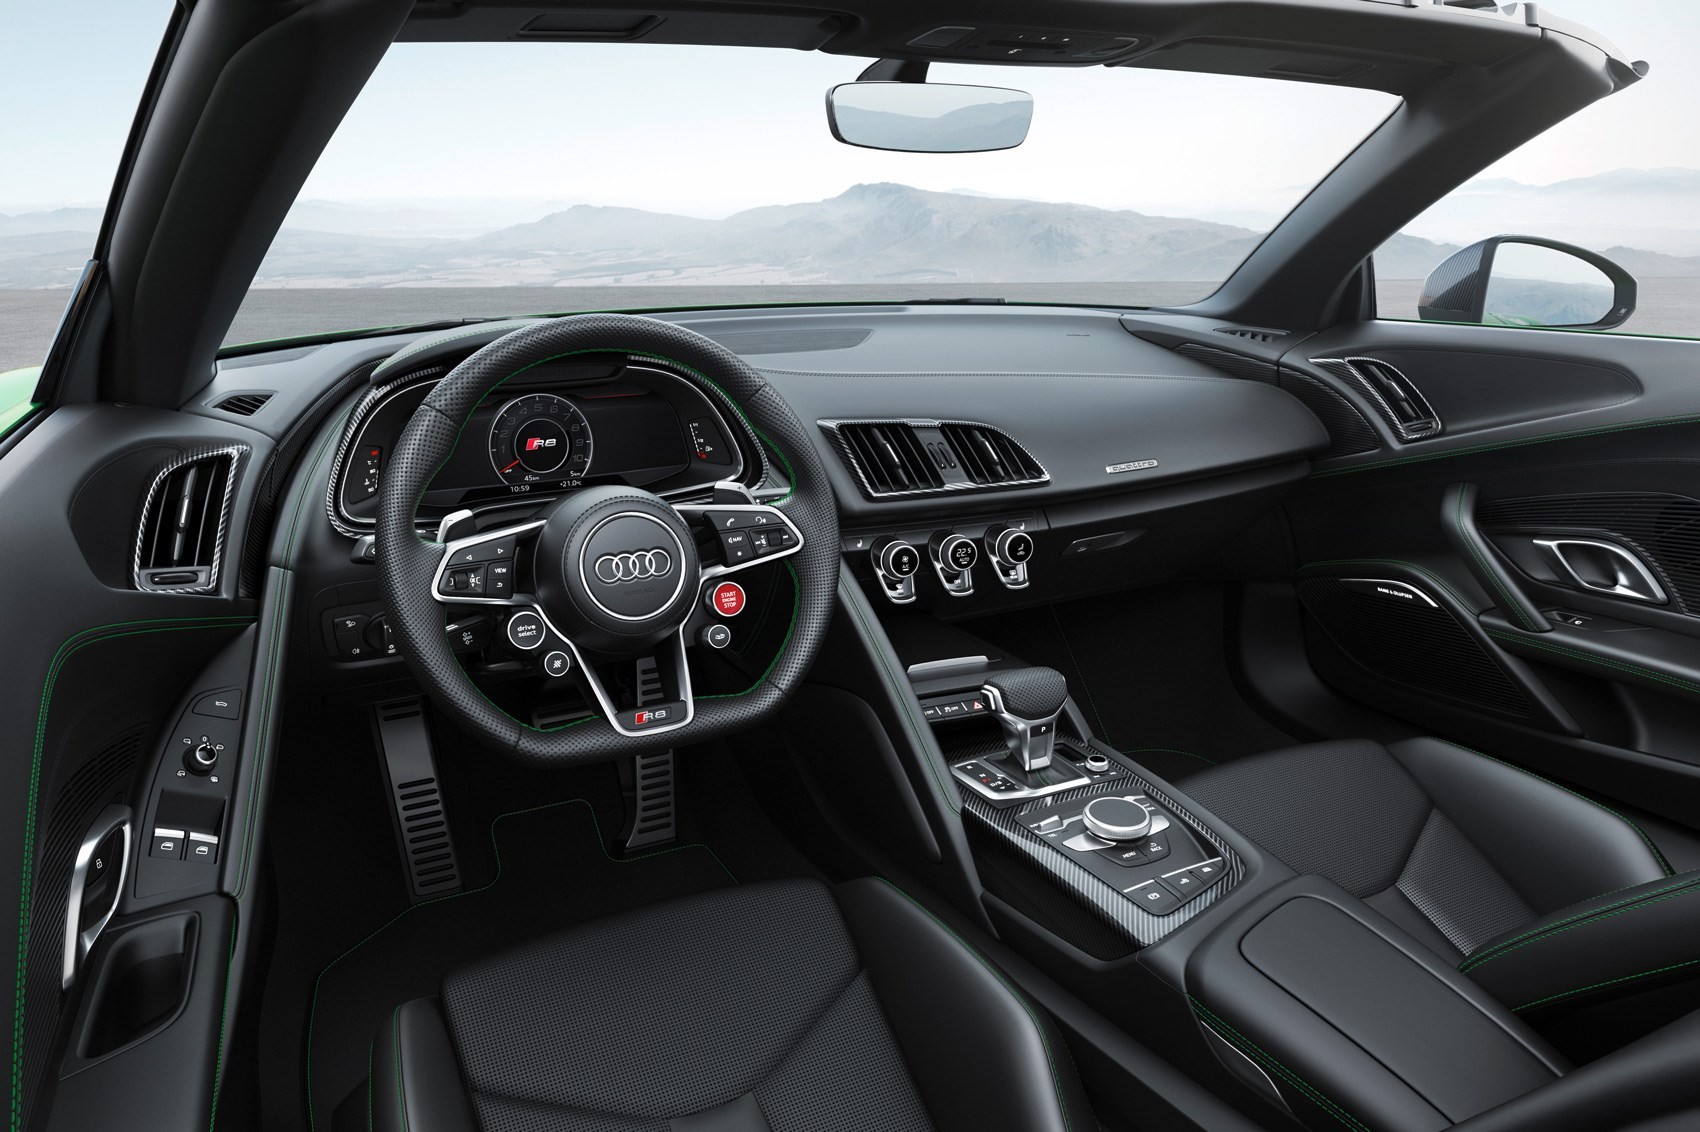 The Hulk Goes New Audi R8 Spyder V10 Plus Revealed